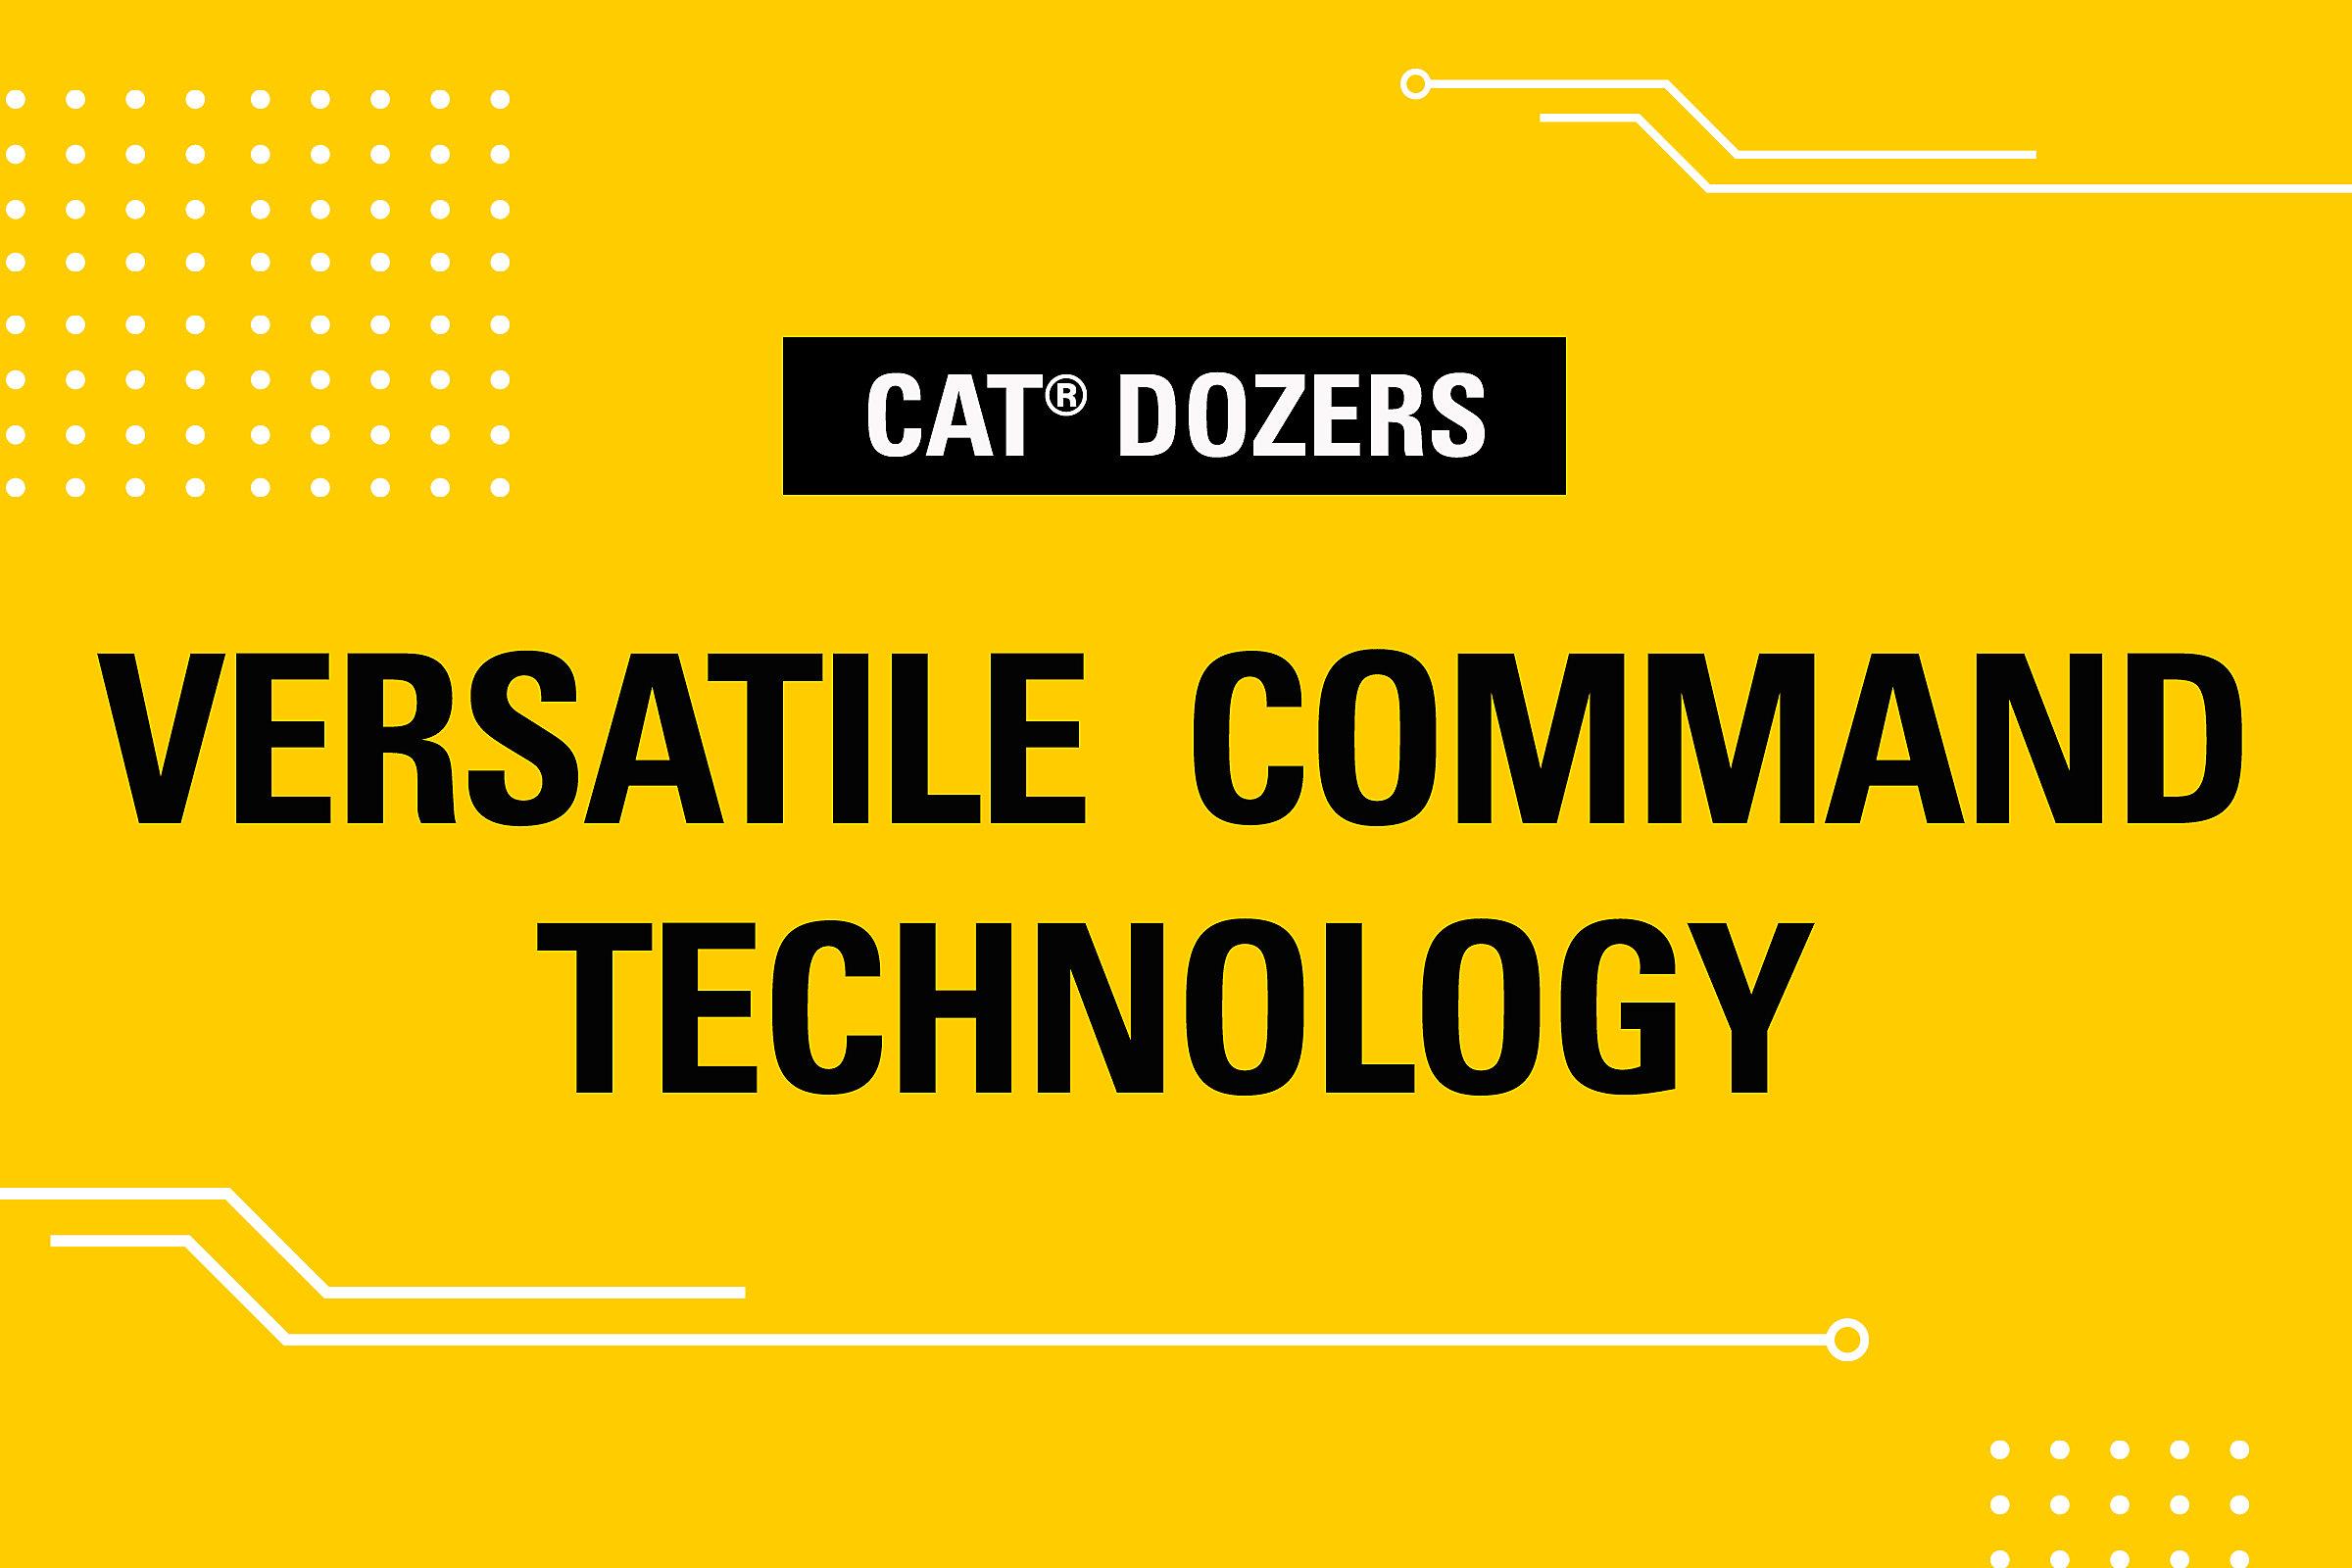 Versatile Command Technology